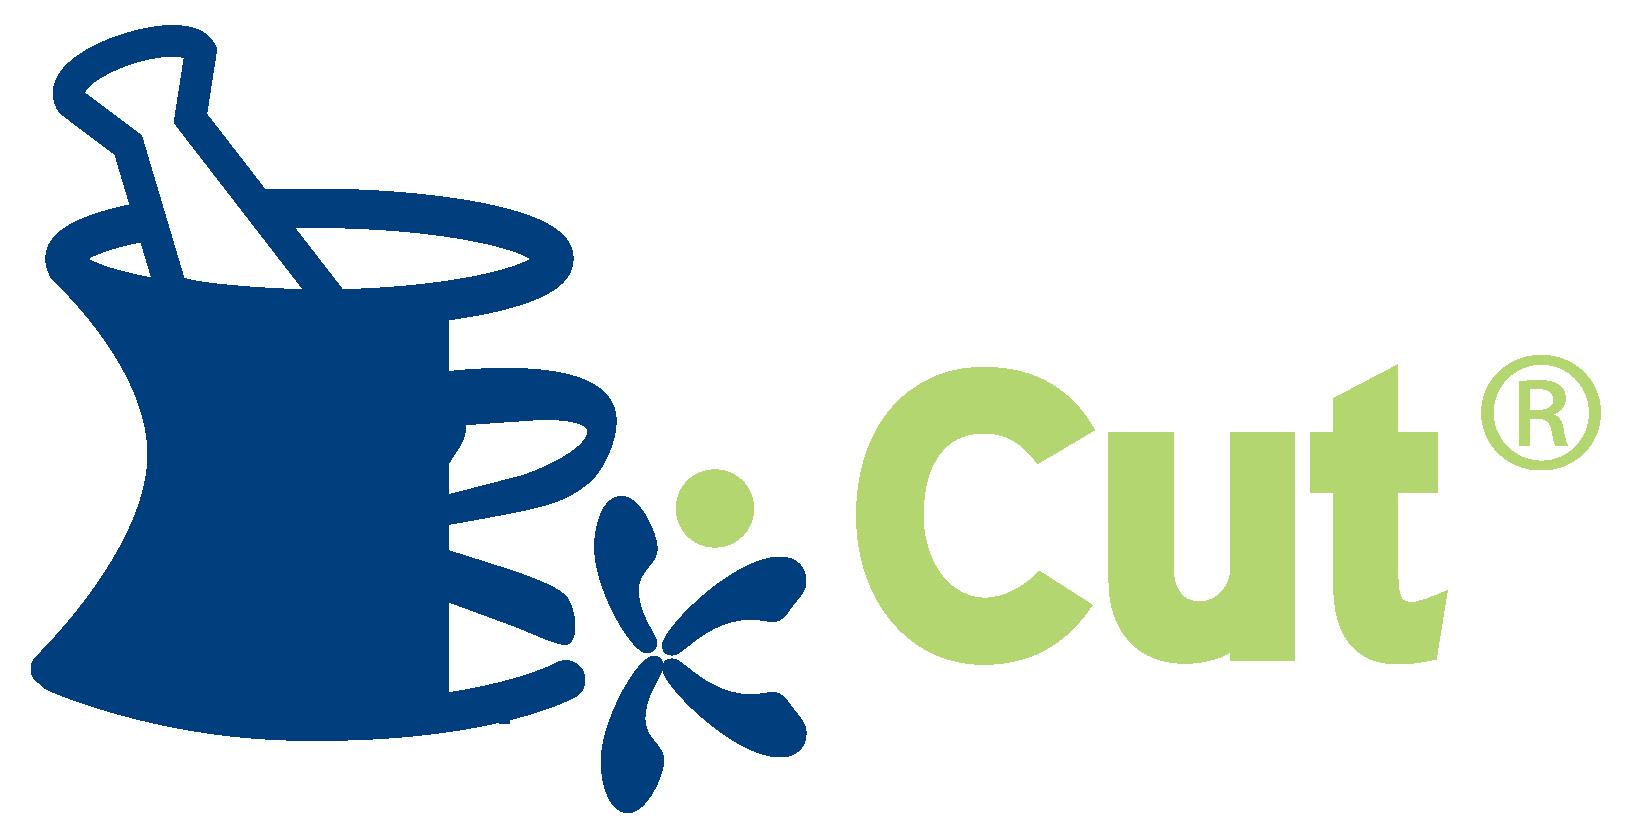 The RxCut free prescription savings card was created to ...